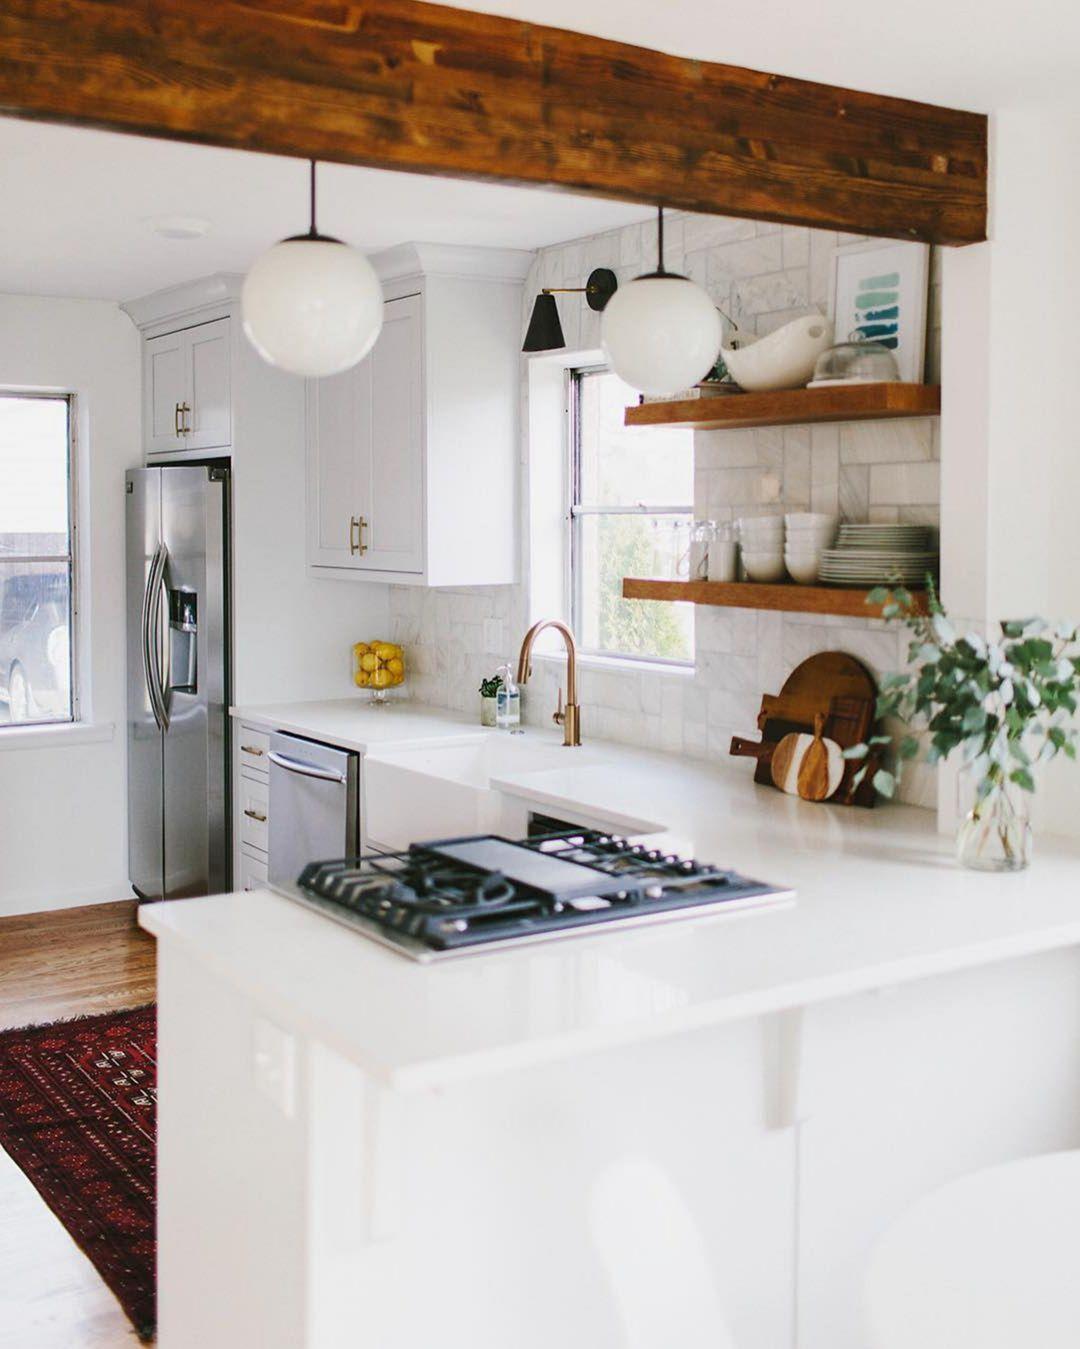 Kitchen Design Small House Gorgeous Best 12 Amazing Small Modern Kitchen Design Ideas 4197 7